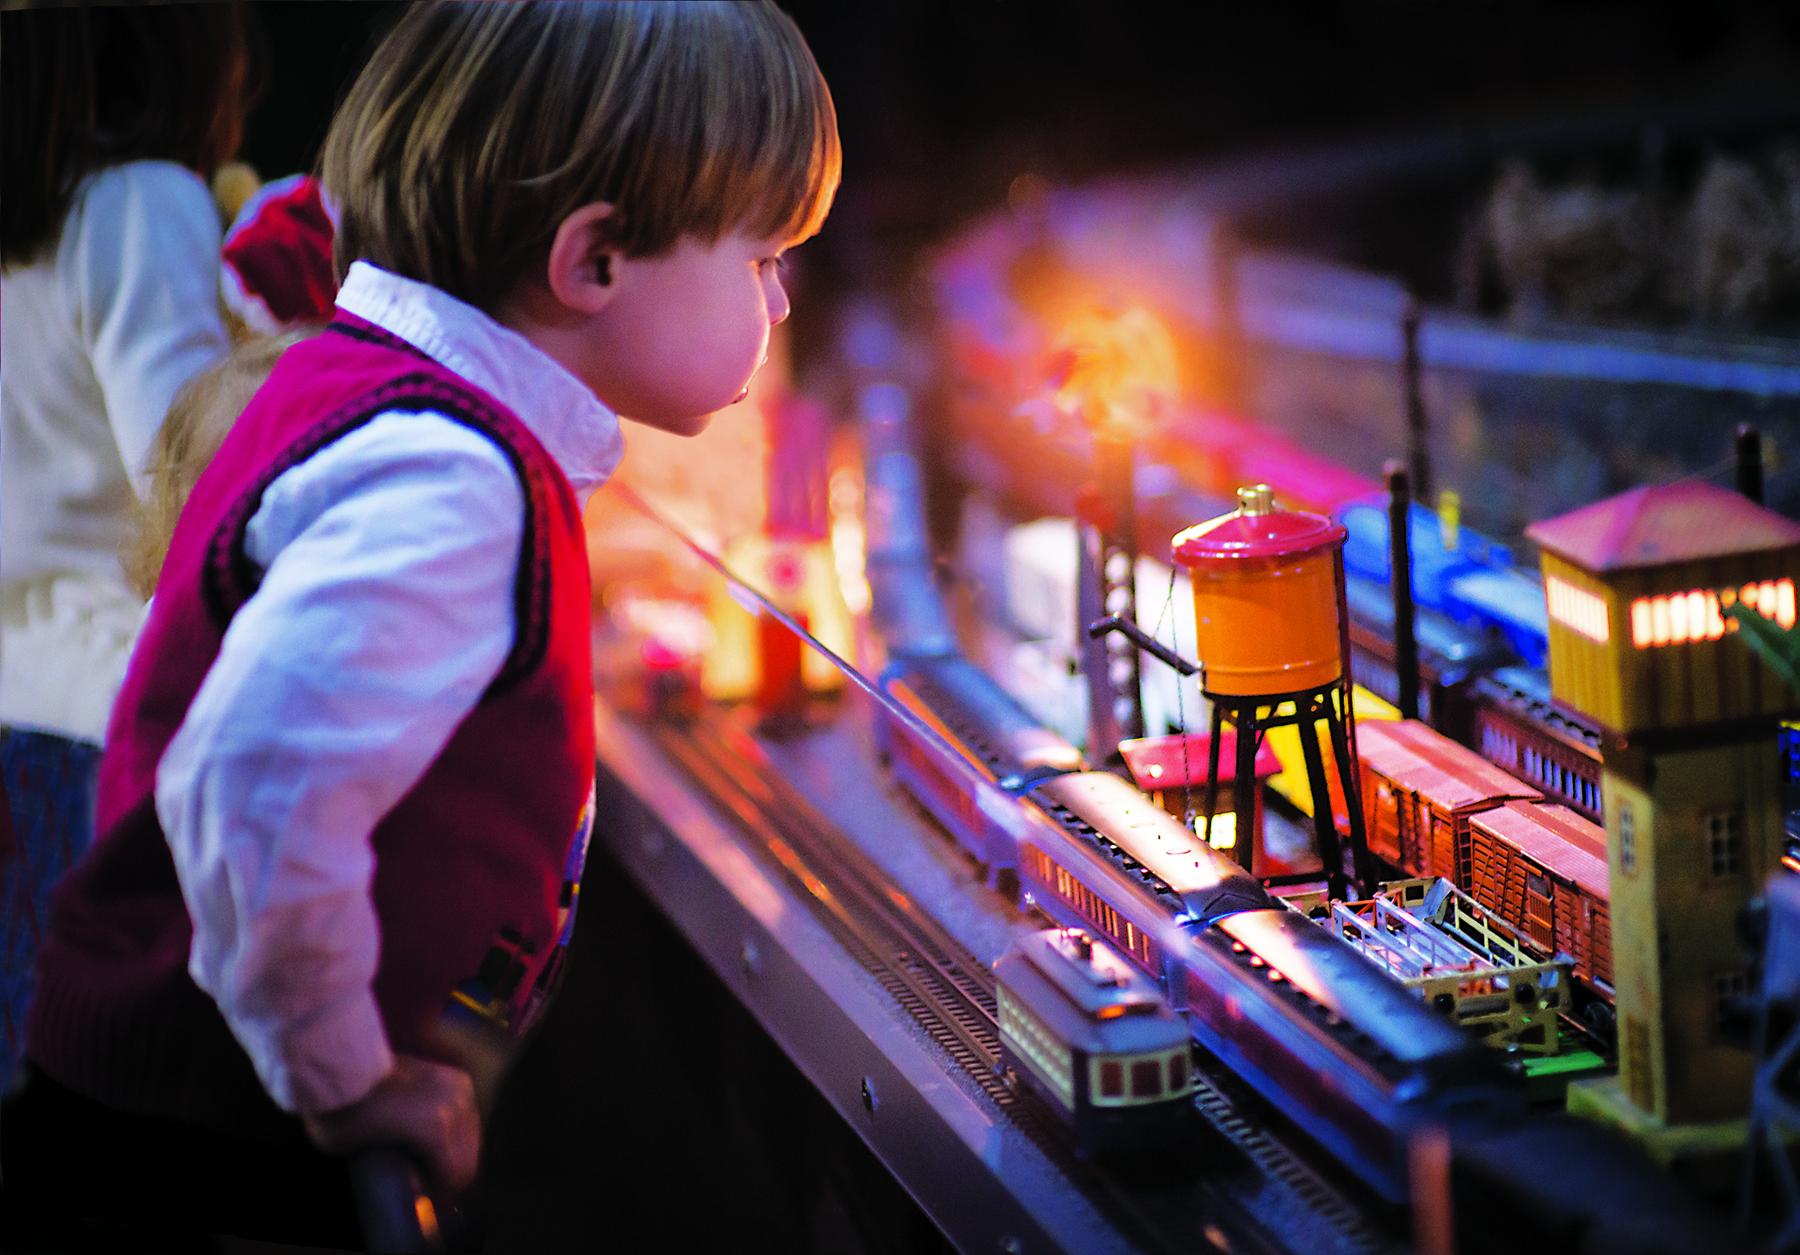 Brandywine Christmas model train display. Photo credit: Carlos Alejandro